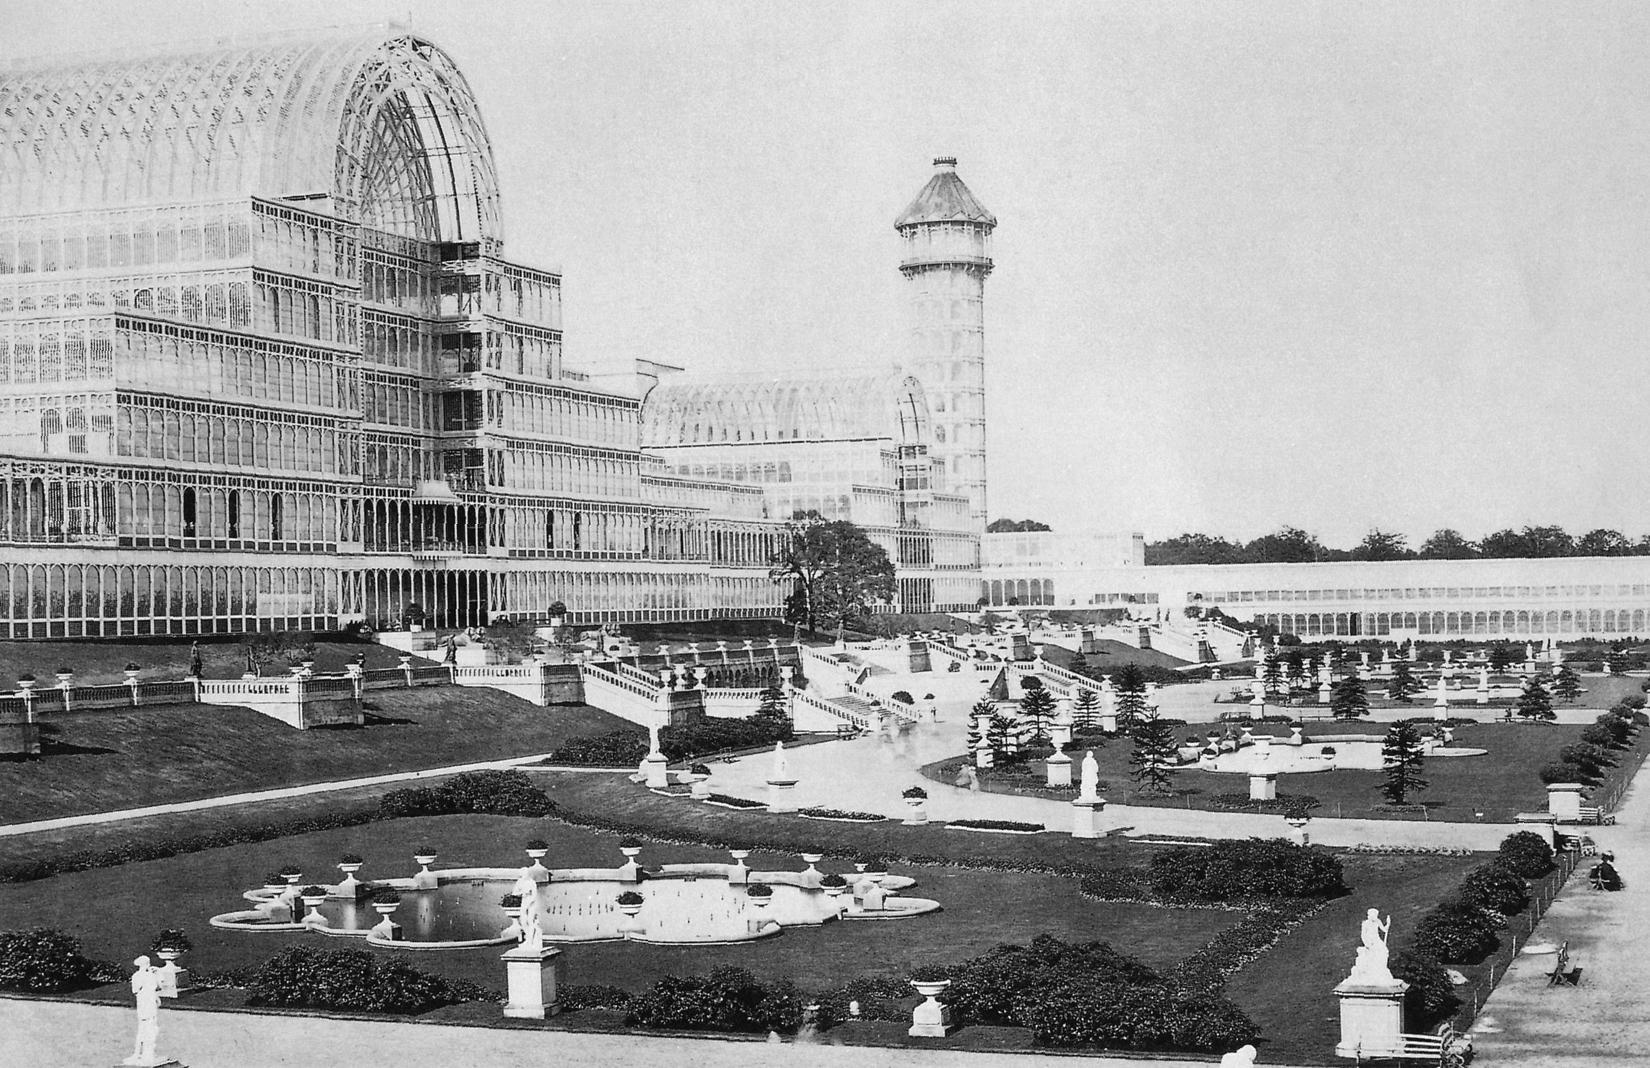 Sydenham Crystal Palace, circa 1851. Creative commons